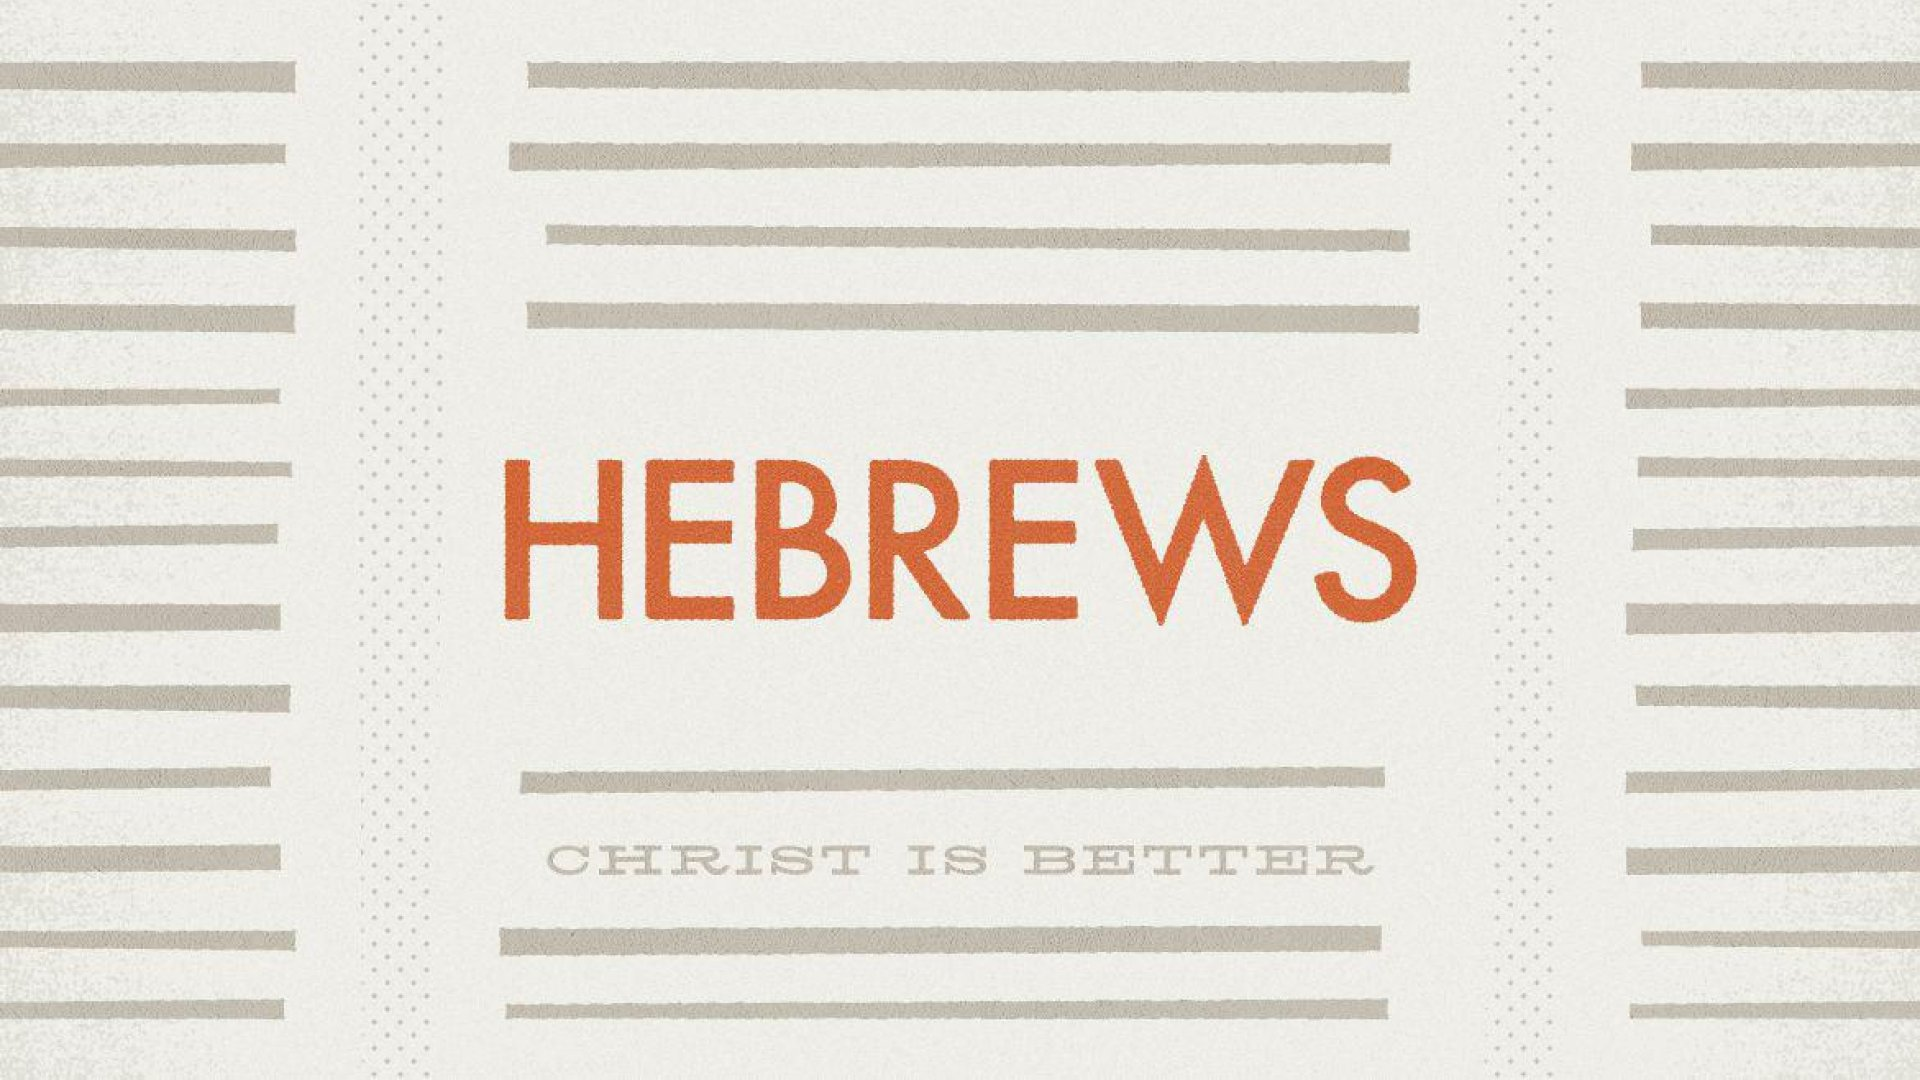 Teaching artwork for Hebrews